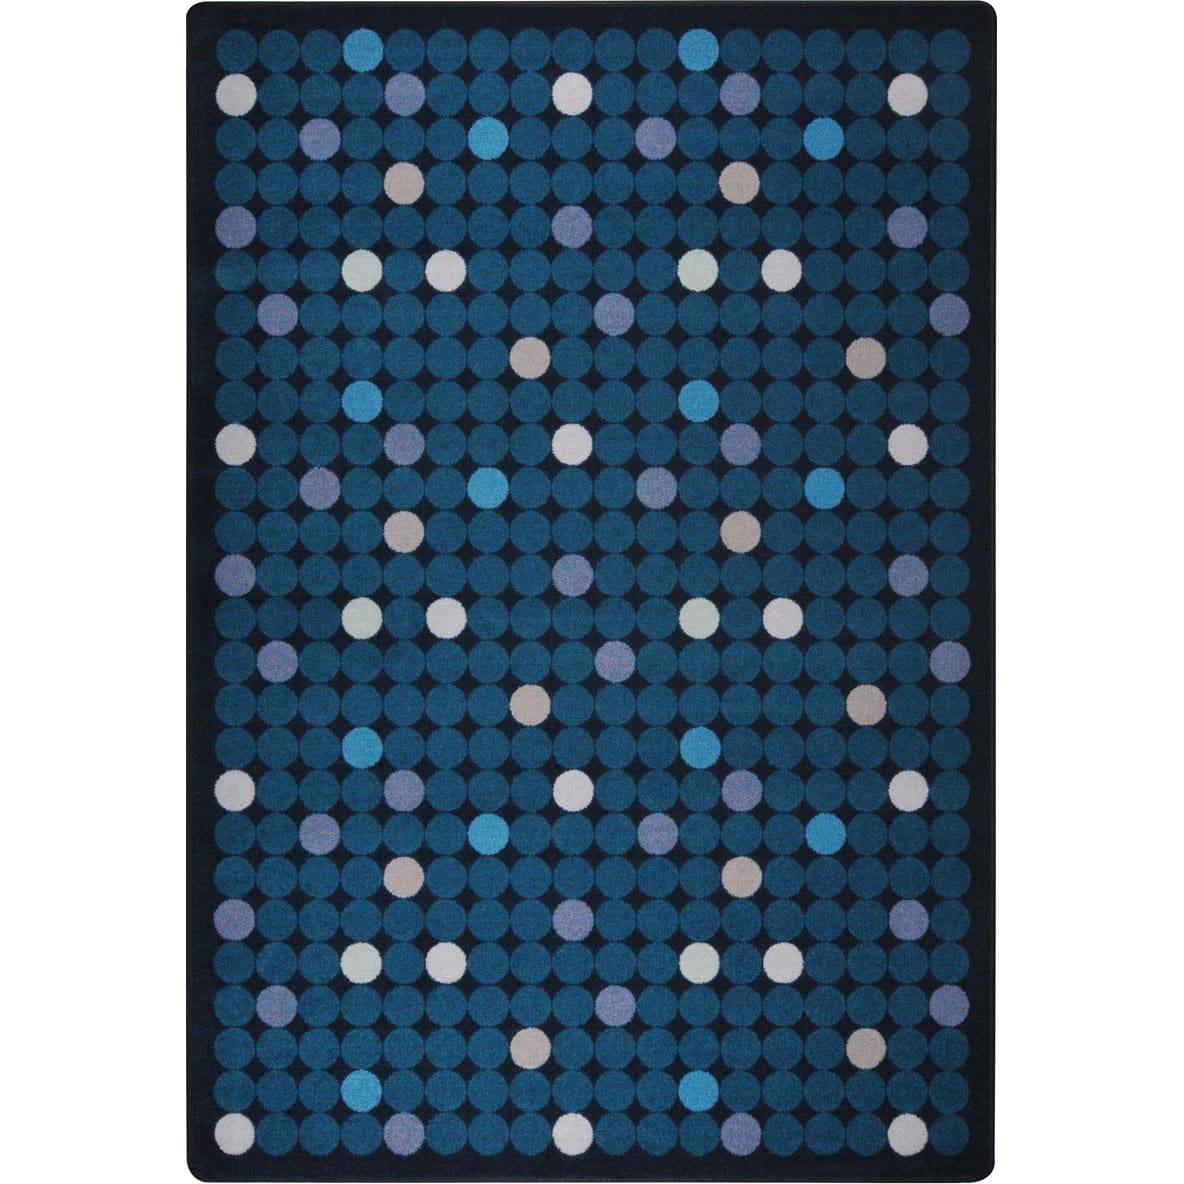 Joy Carpets Playful Patterns Spot On Seaside Rug Studio